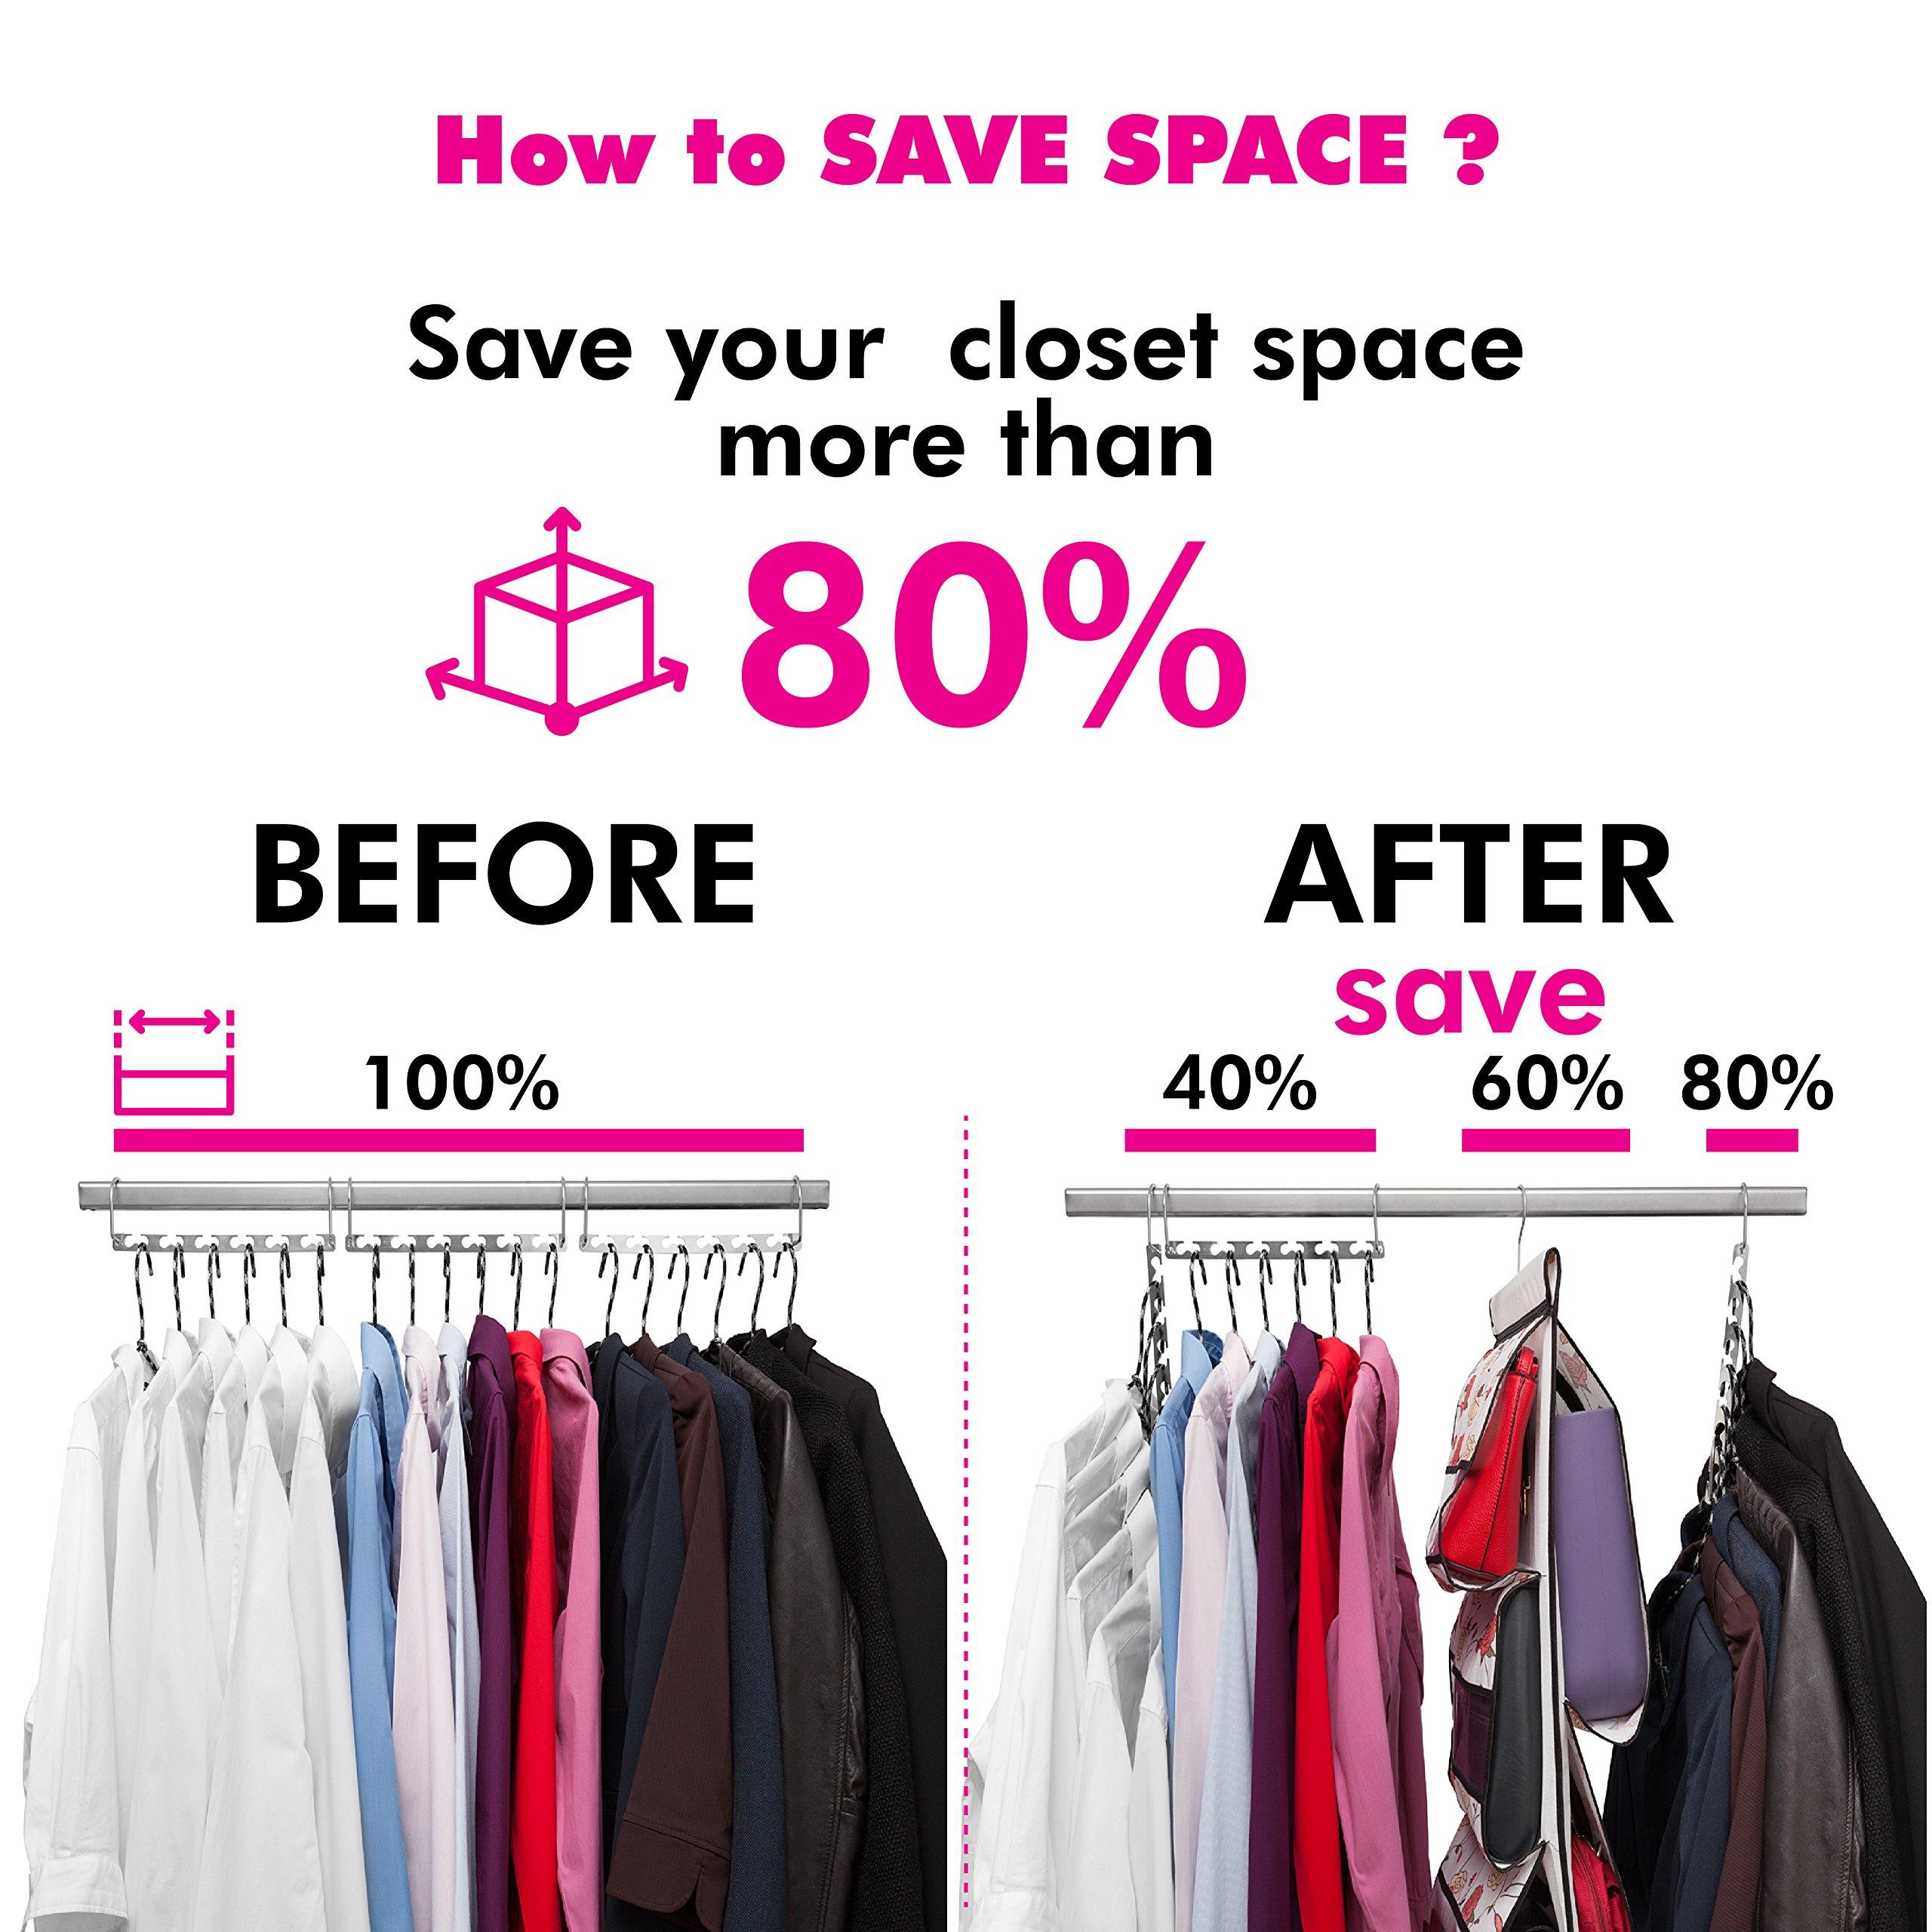 Closet Organization Set - Includes - Space Saving Hangers For Clothes (set of 3) - Hanging Purse And Handbag Organizer - Hanger Purses Hook - Tehspace